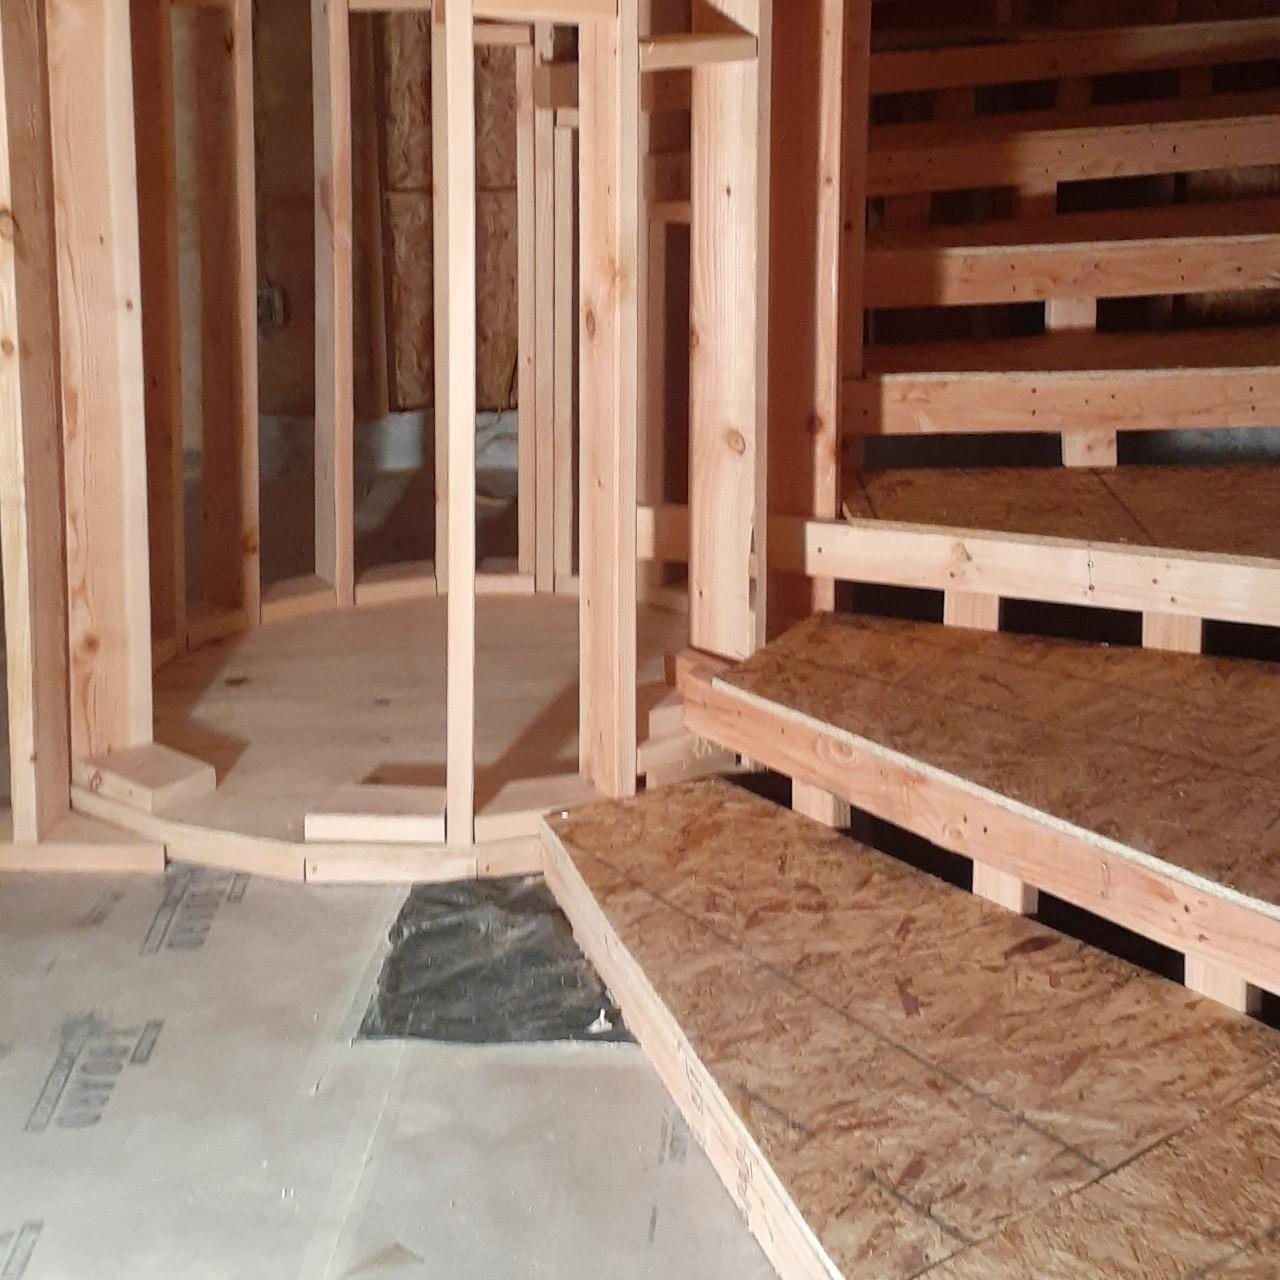 carpentry-wood-framing-second-floor-home-addition--framing-32